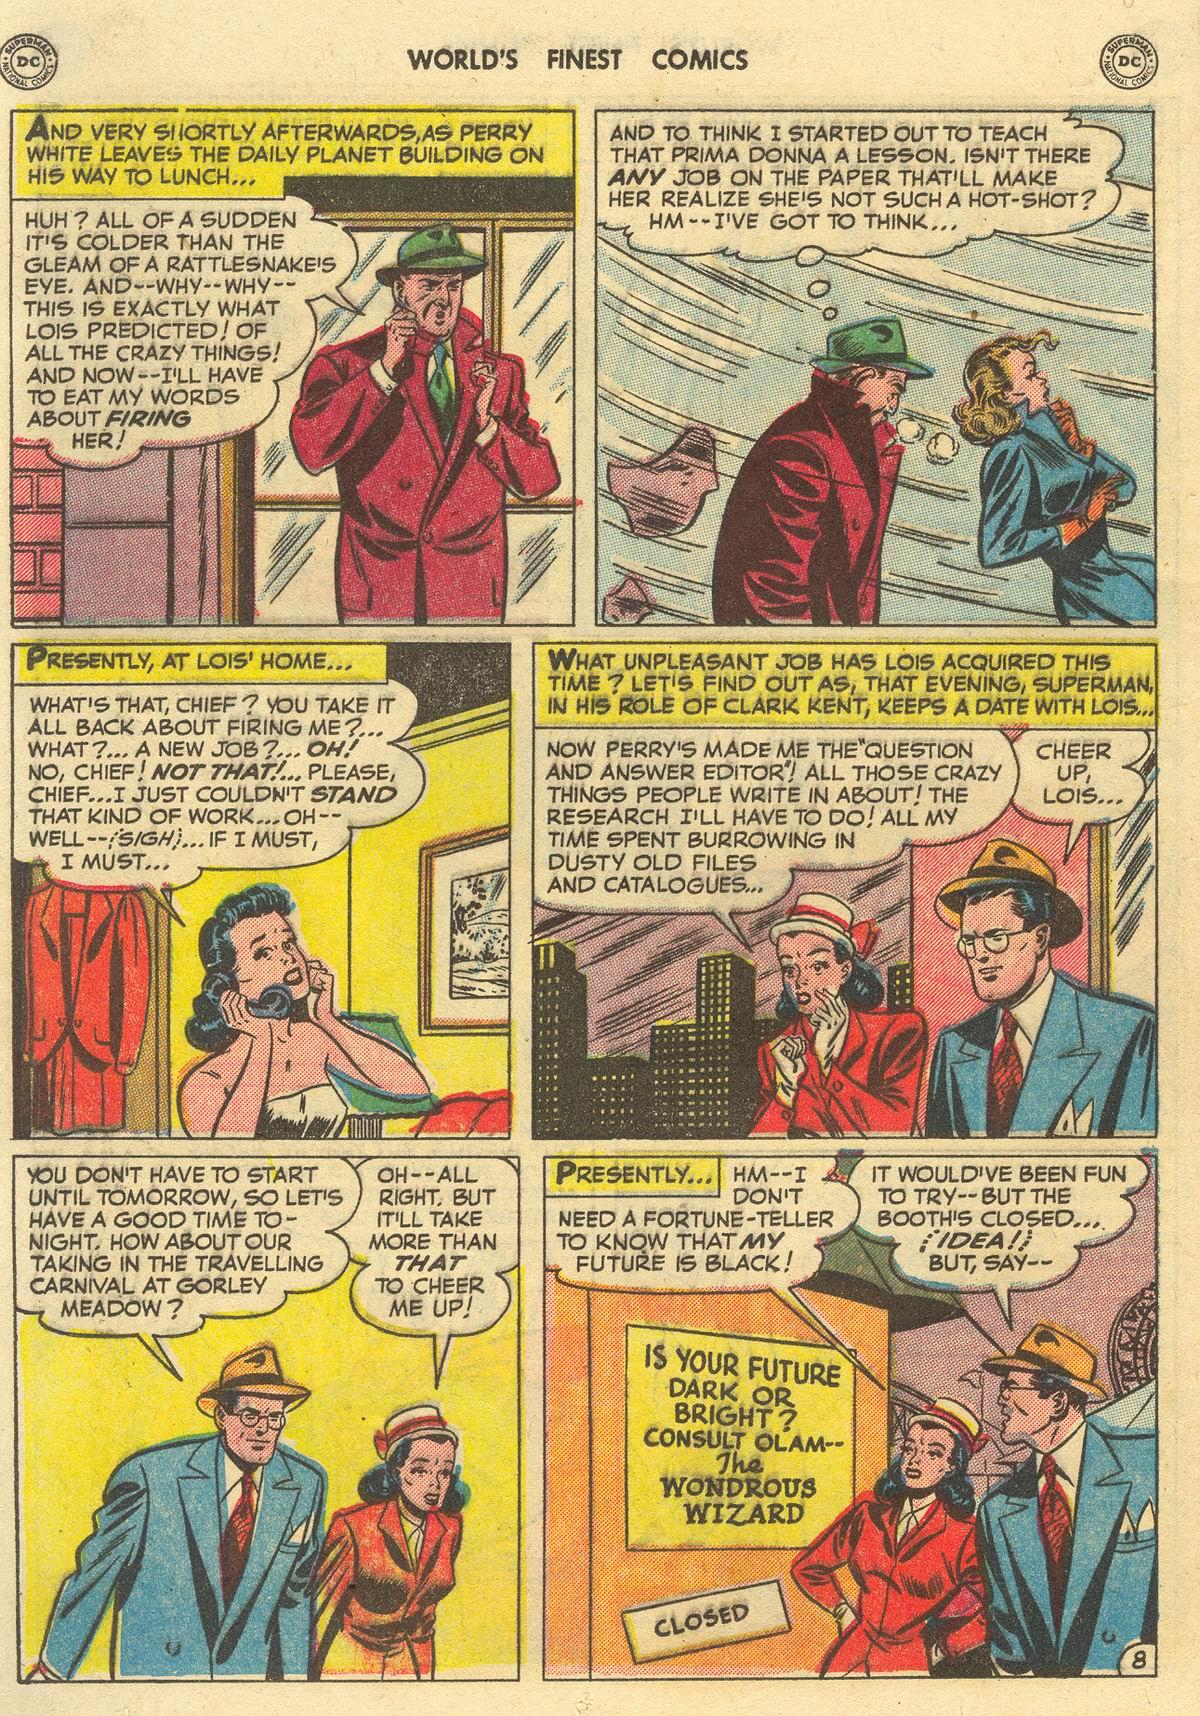 Read online World's Finest Comics comic -  Issue #51 - 10